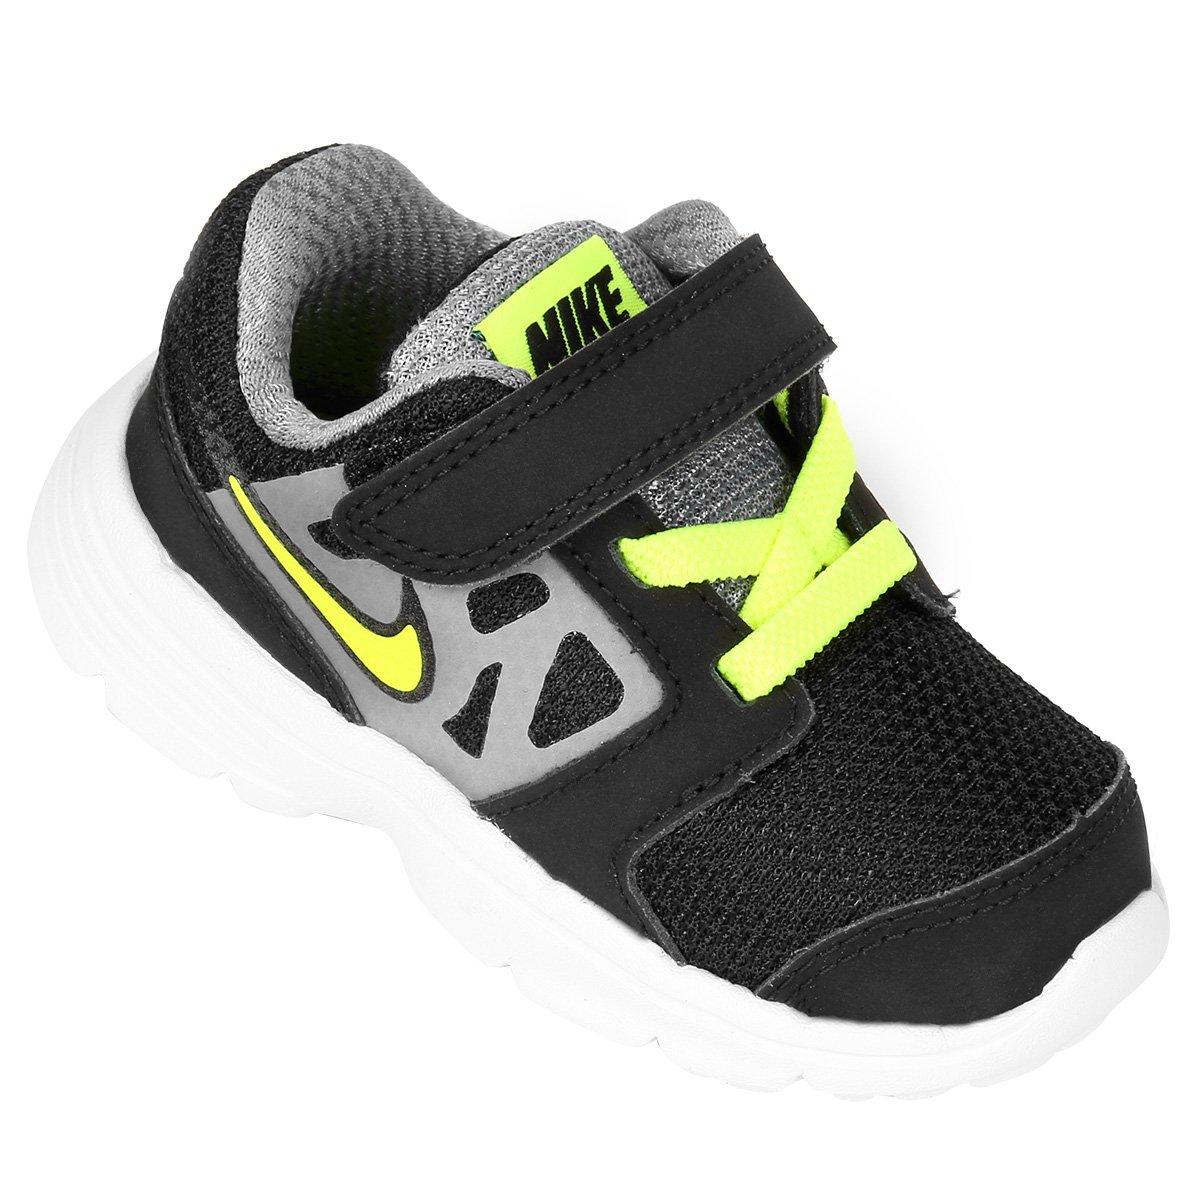 7eef5b1f3c7 Tênis Nike Downshifter 6 Infantil - Compre Agora